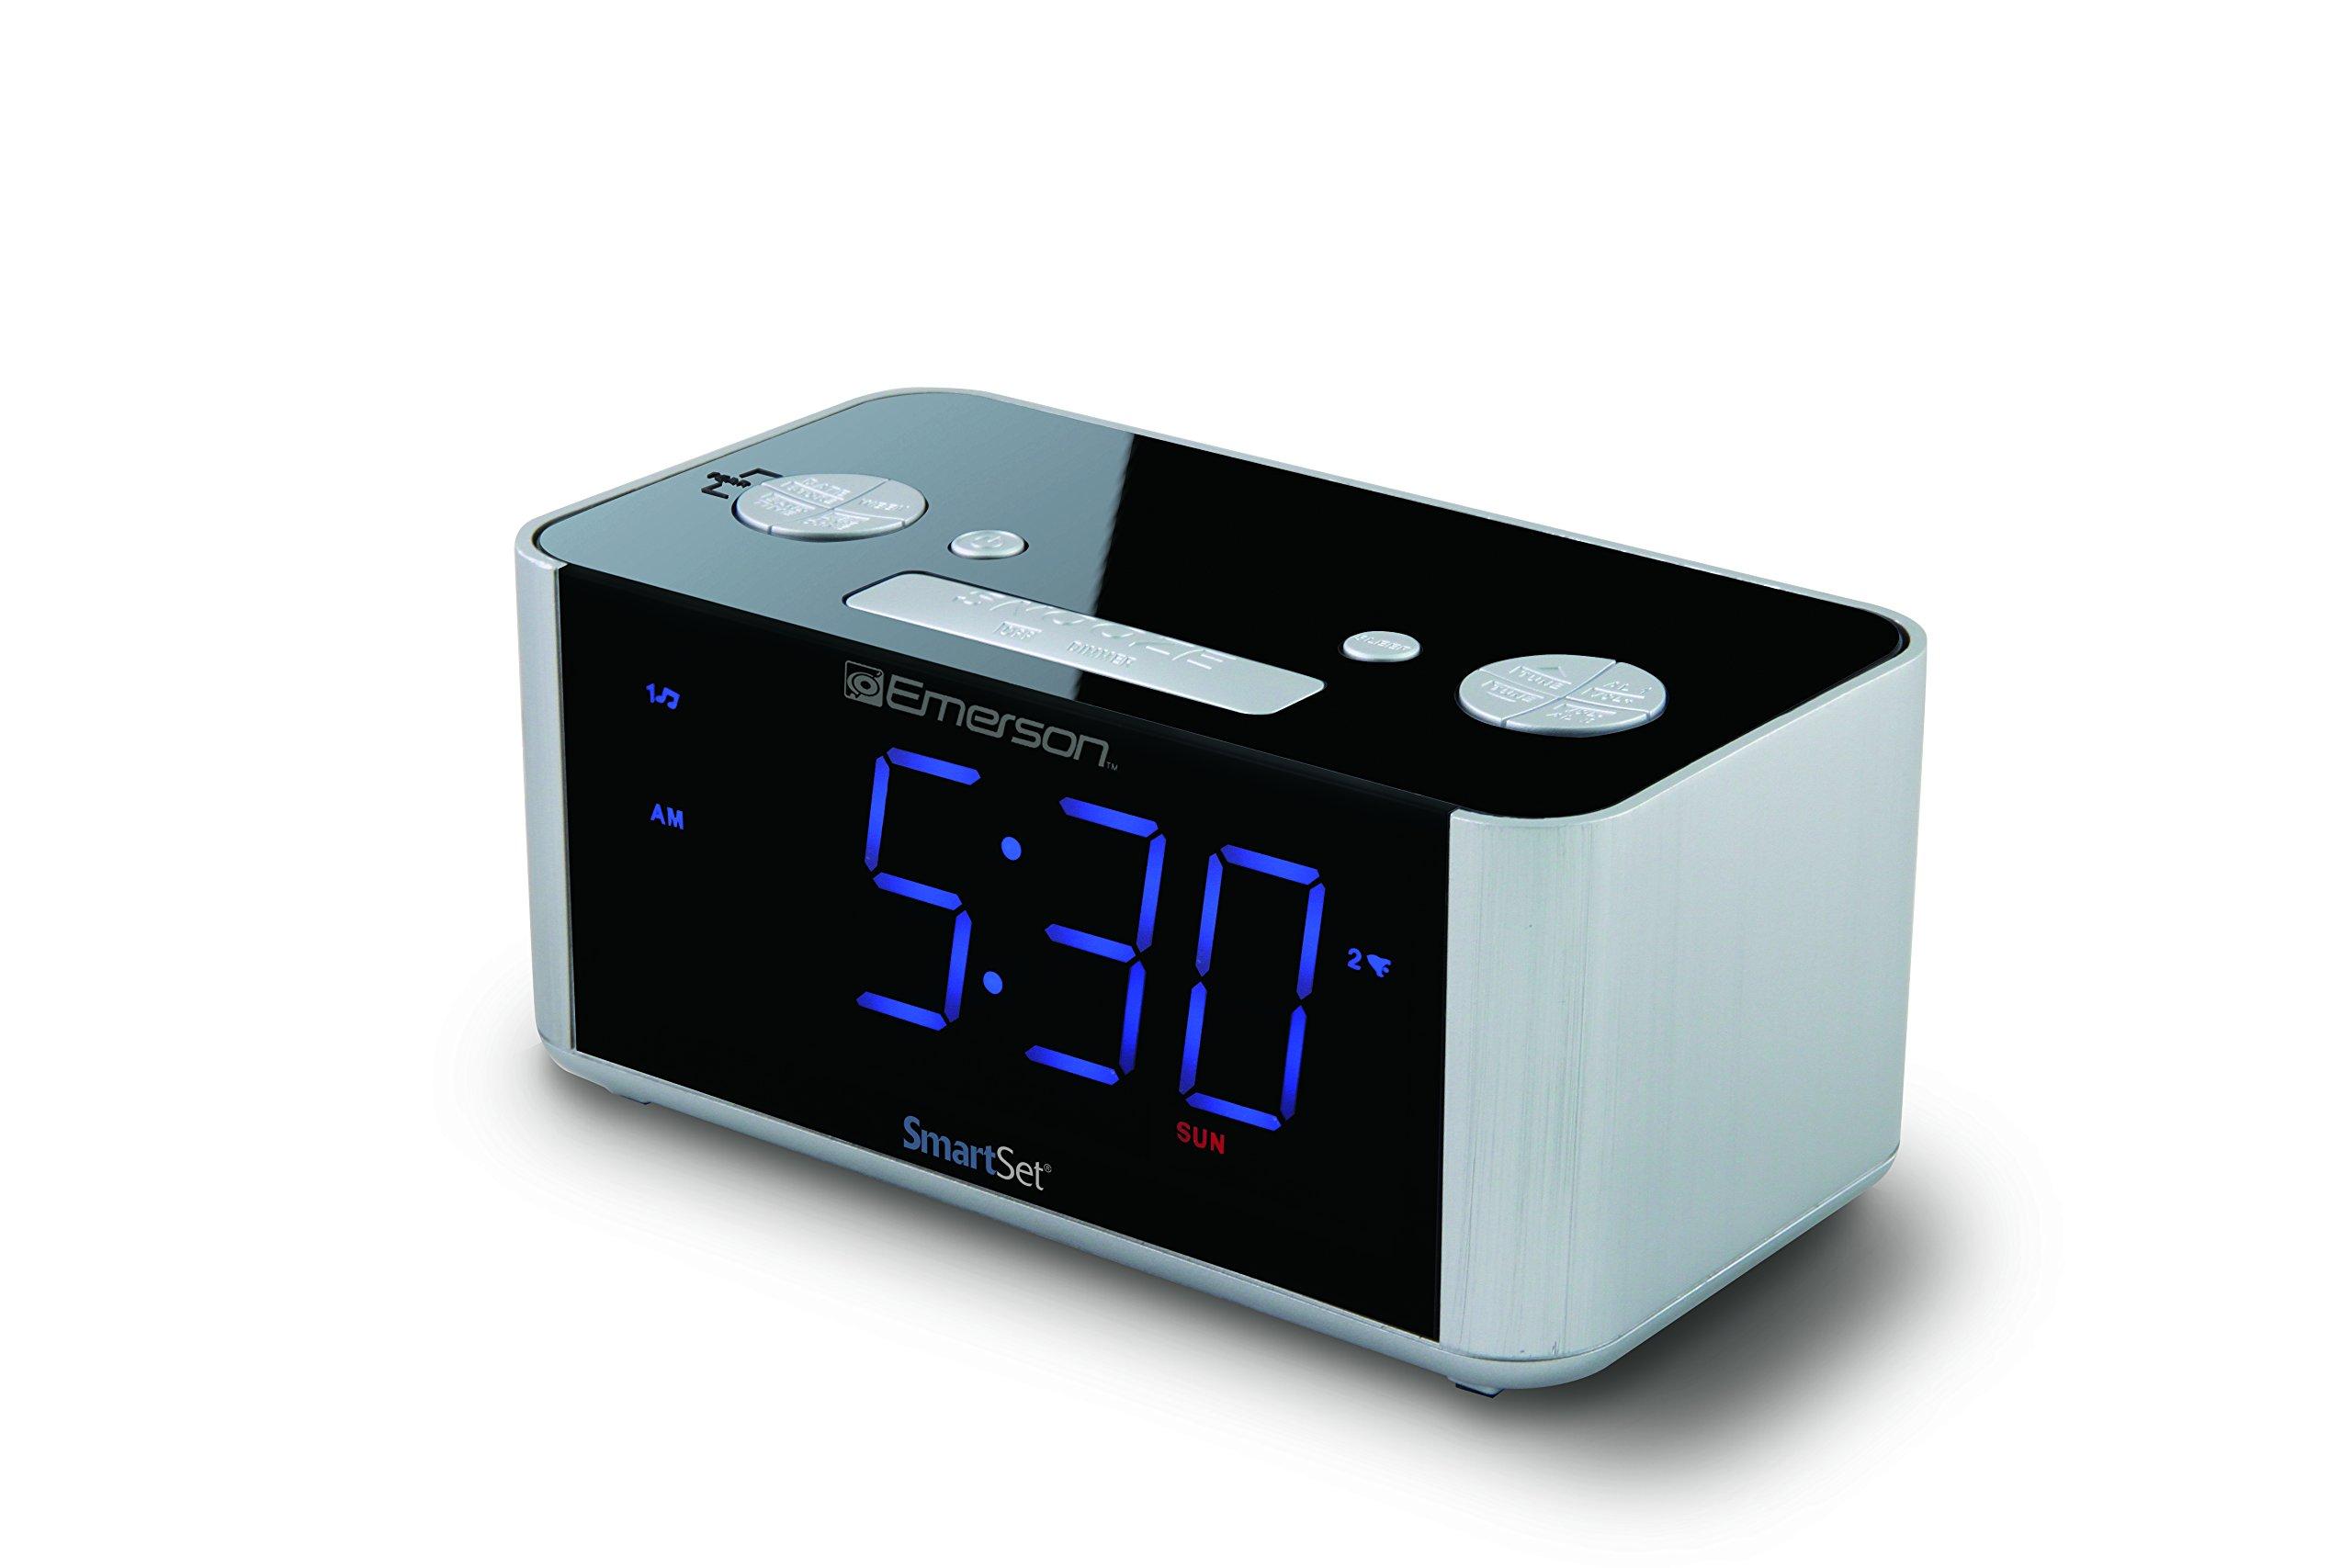 Emerson SmartSet Alarm Clock Radio, USB port for iPhone/iPad/iPod/Android and Tablets, CKS1708